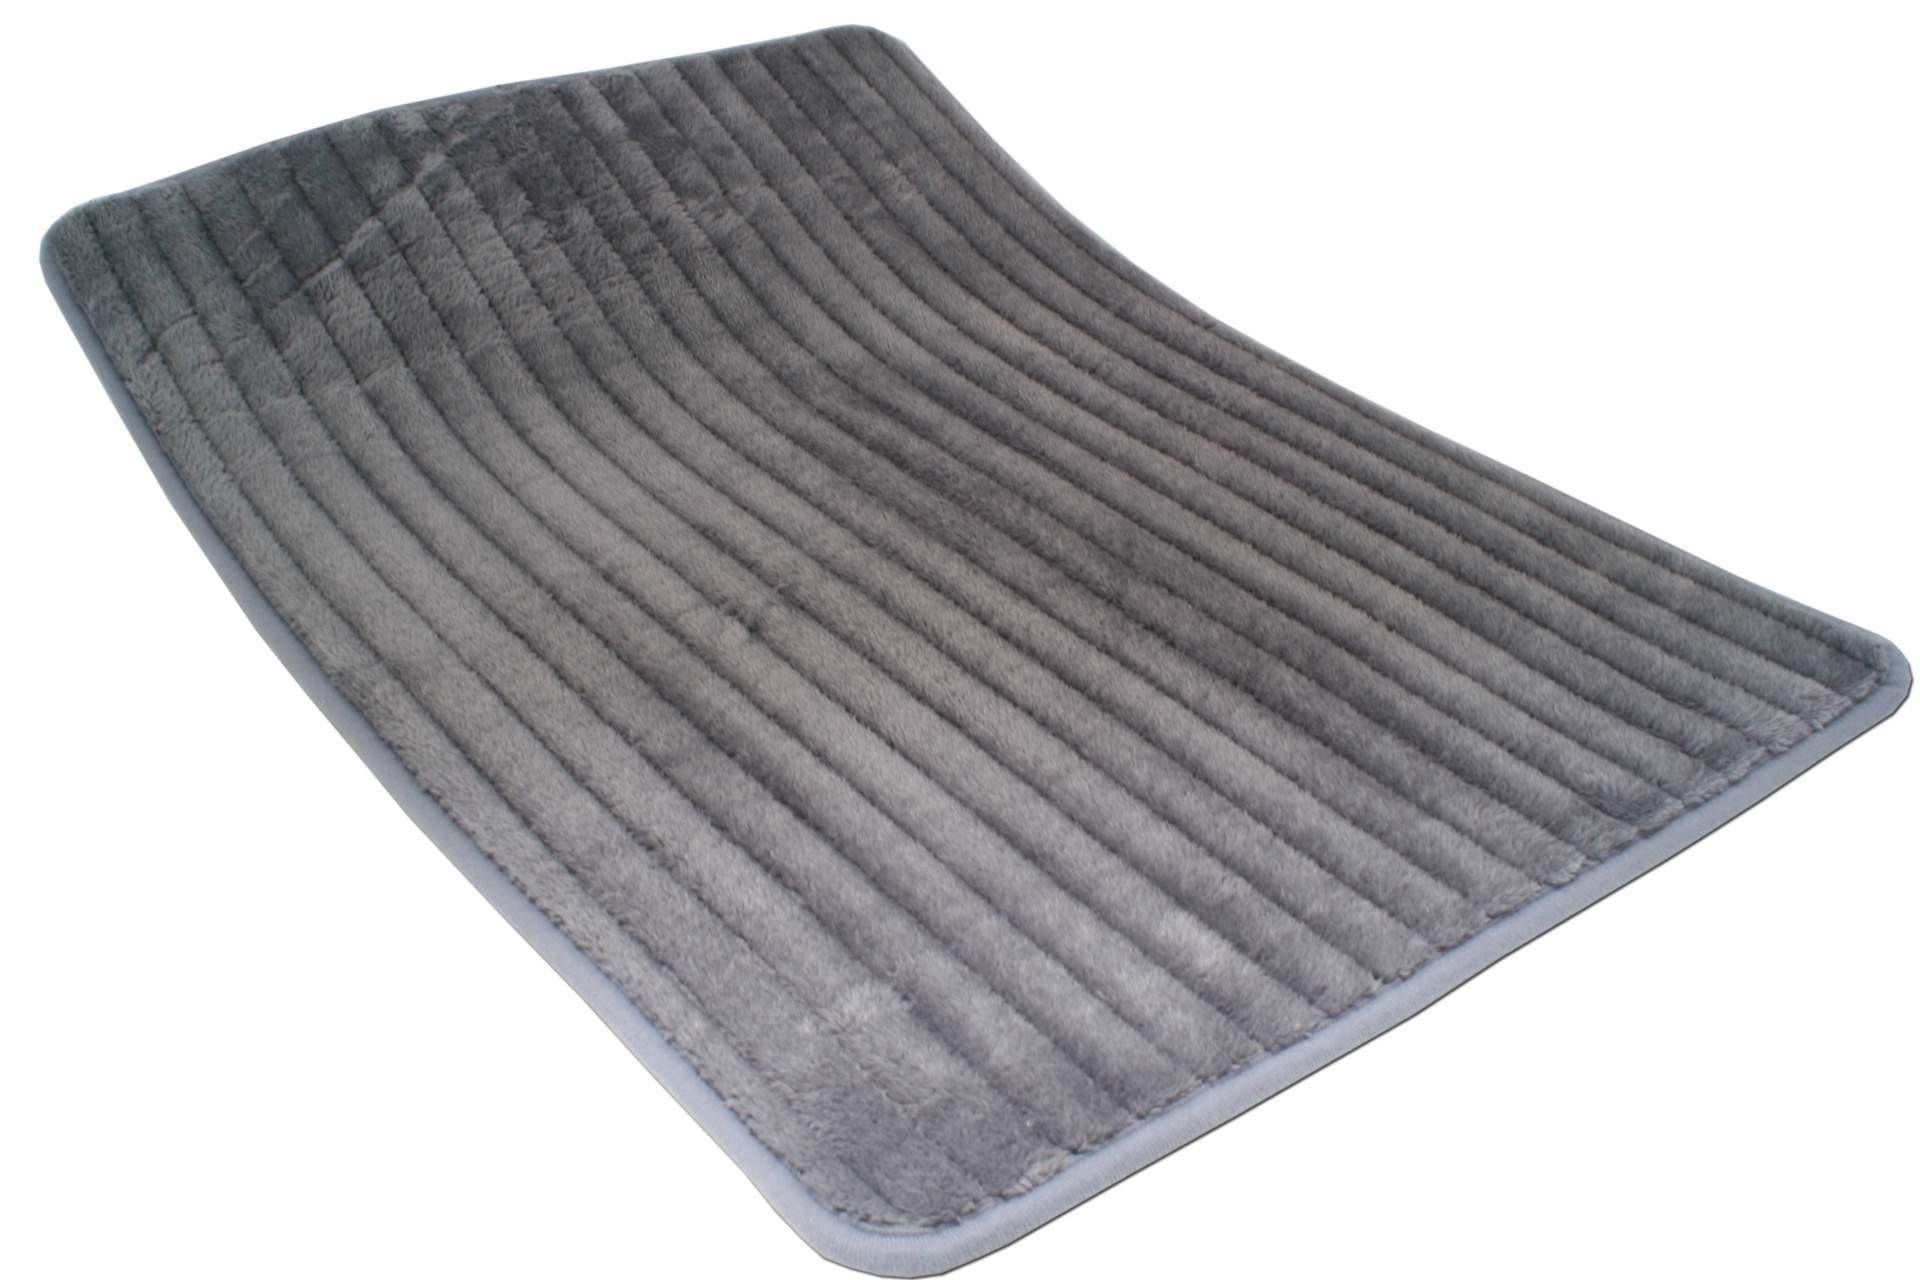 badematte grau 50 x 70 cm mikrofaser badezimmer teppich. Black Bedroom Furniture Sets. Home Design Ideas